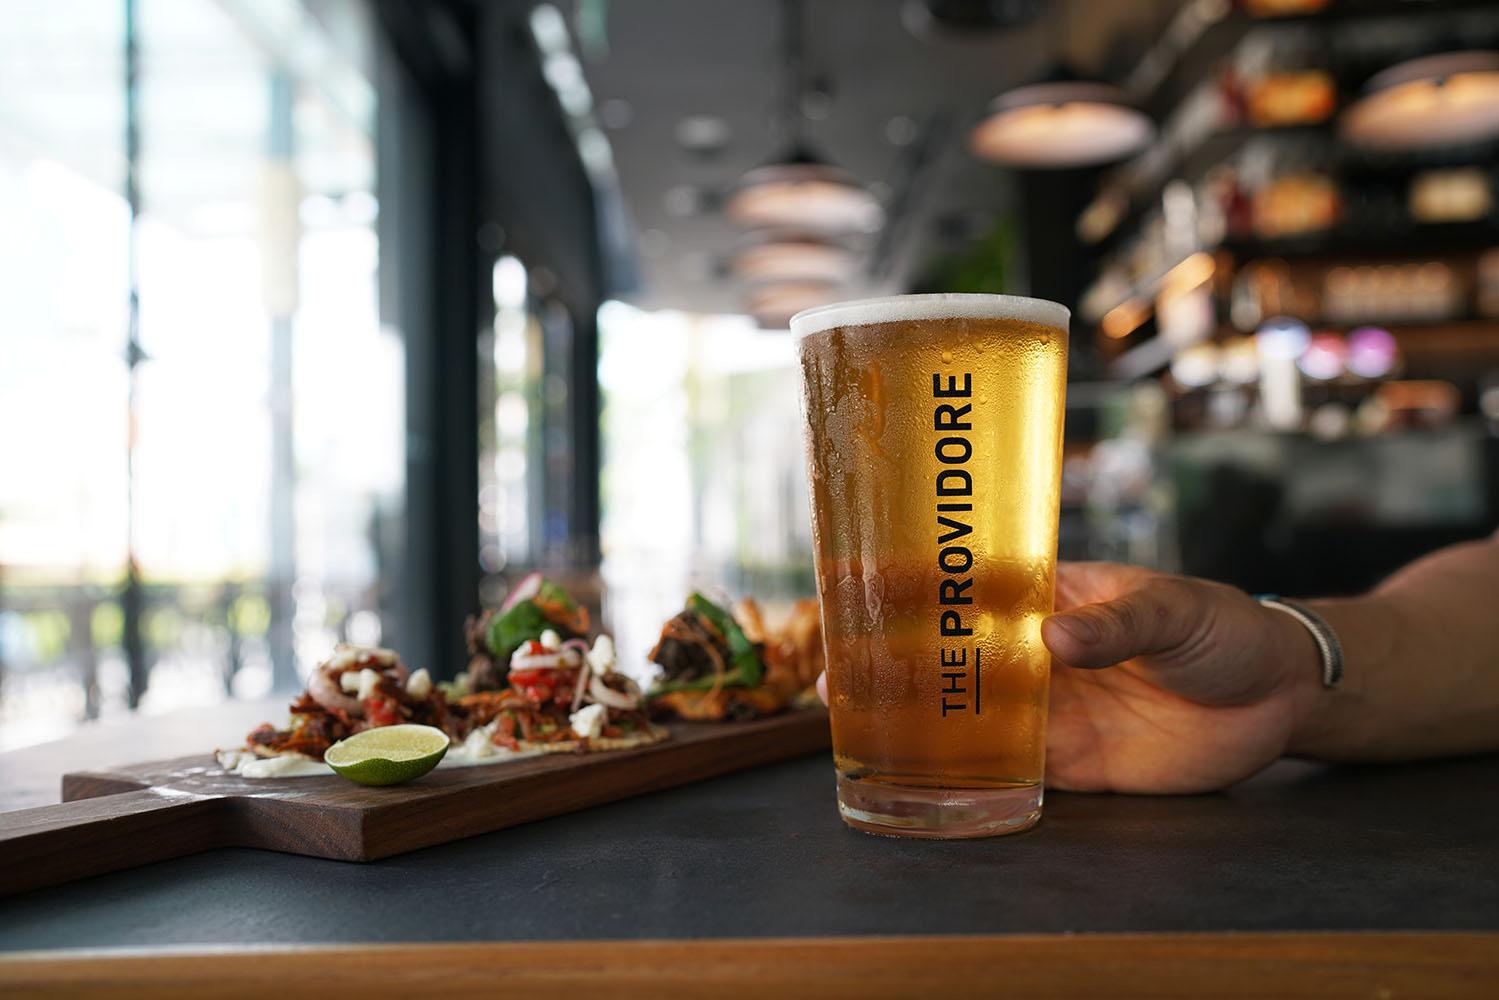 Providore Raffles City Beer and Tapas